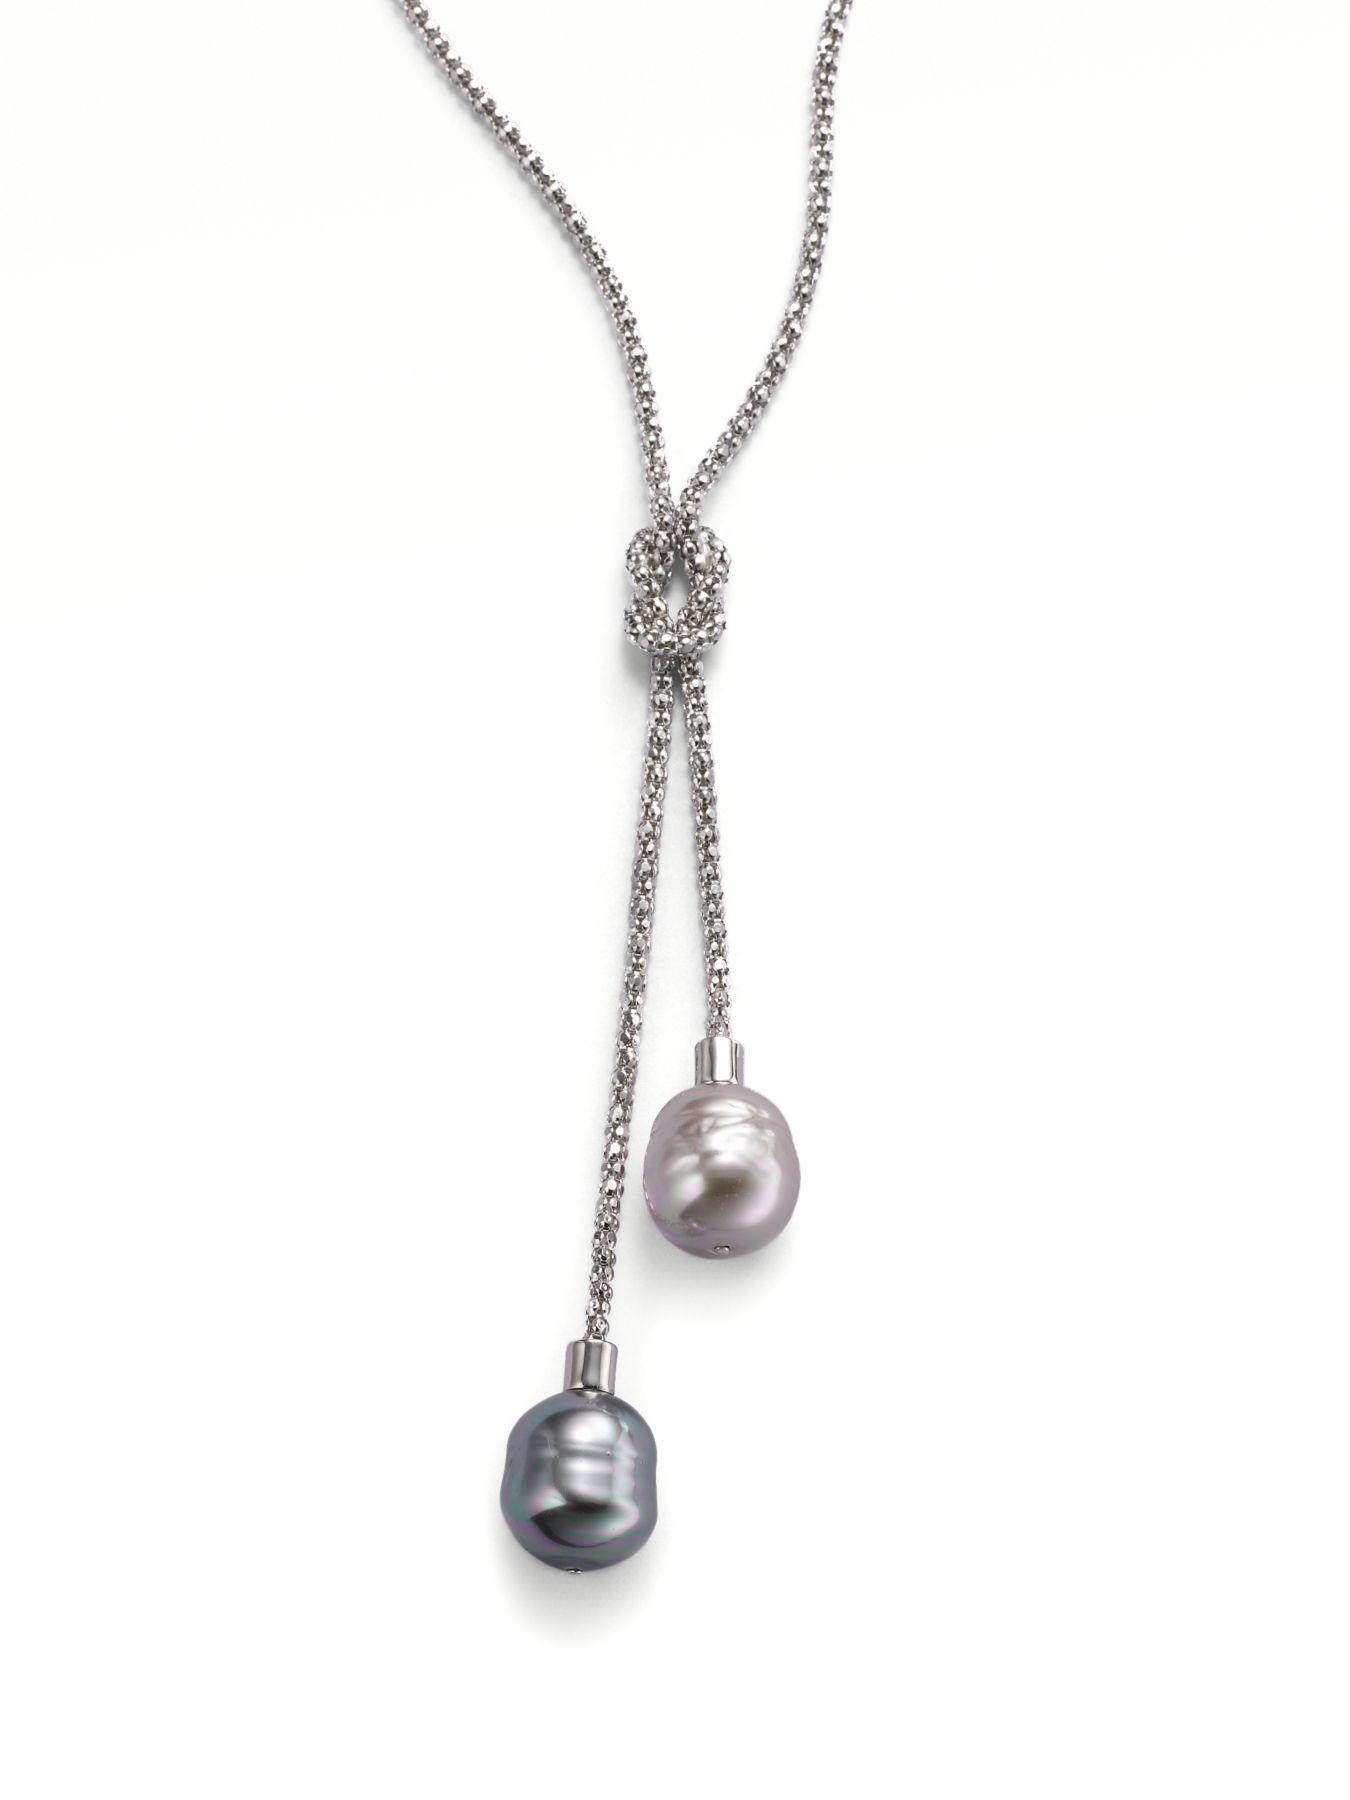 Sterling Silver Adjustable Lariat Necklace